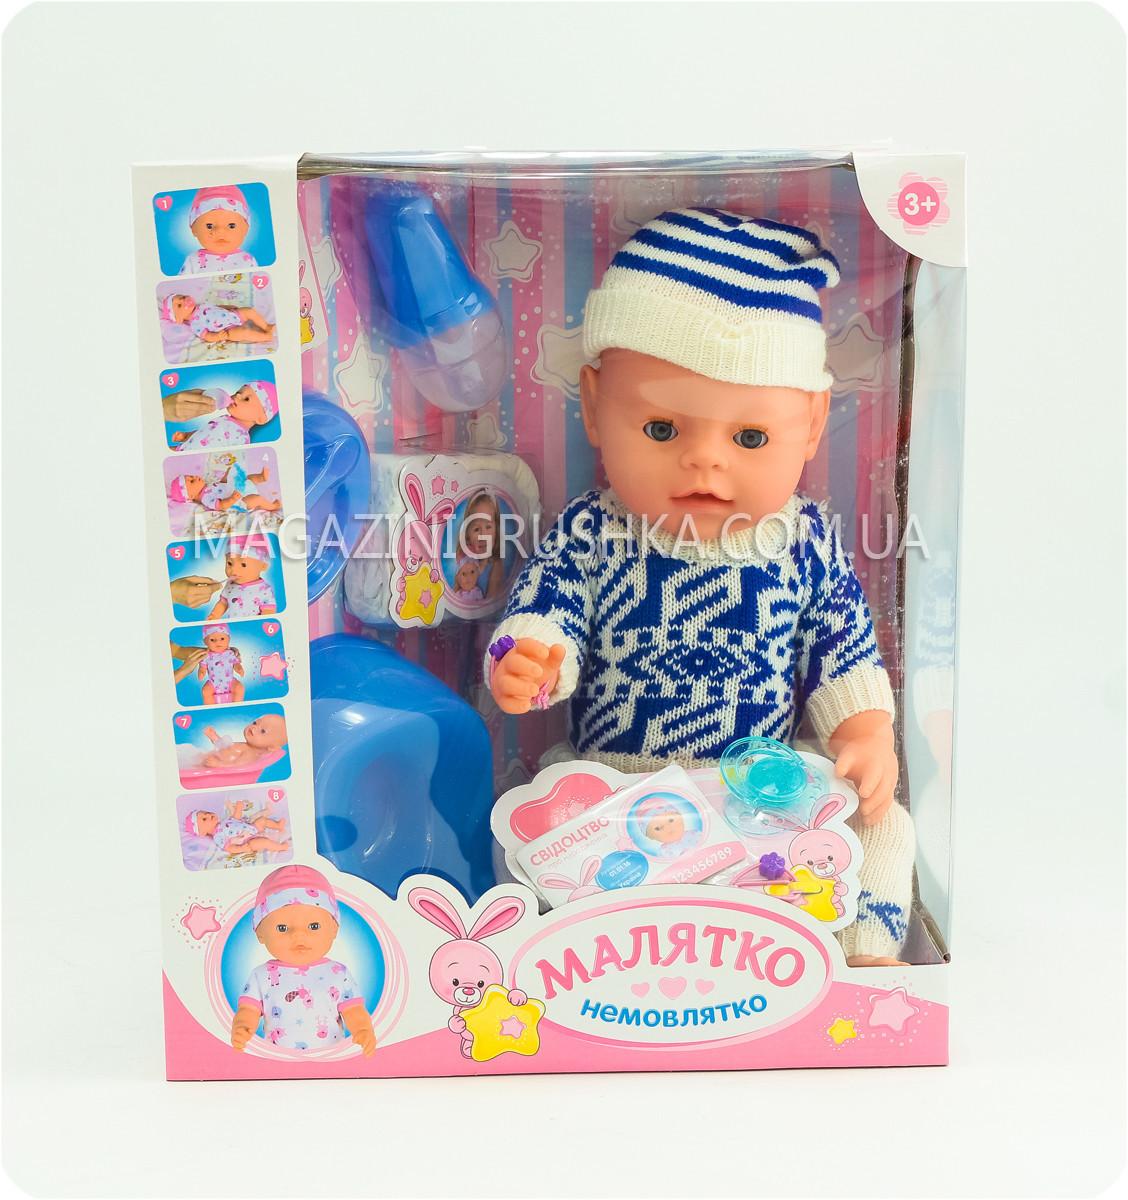 "Пупс ""Малятко-немовлятко"" с аксессуарами и одеждой BL013D-S-UA (8 функций)"